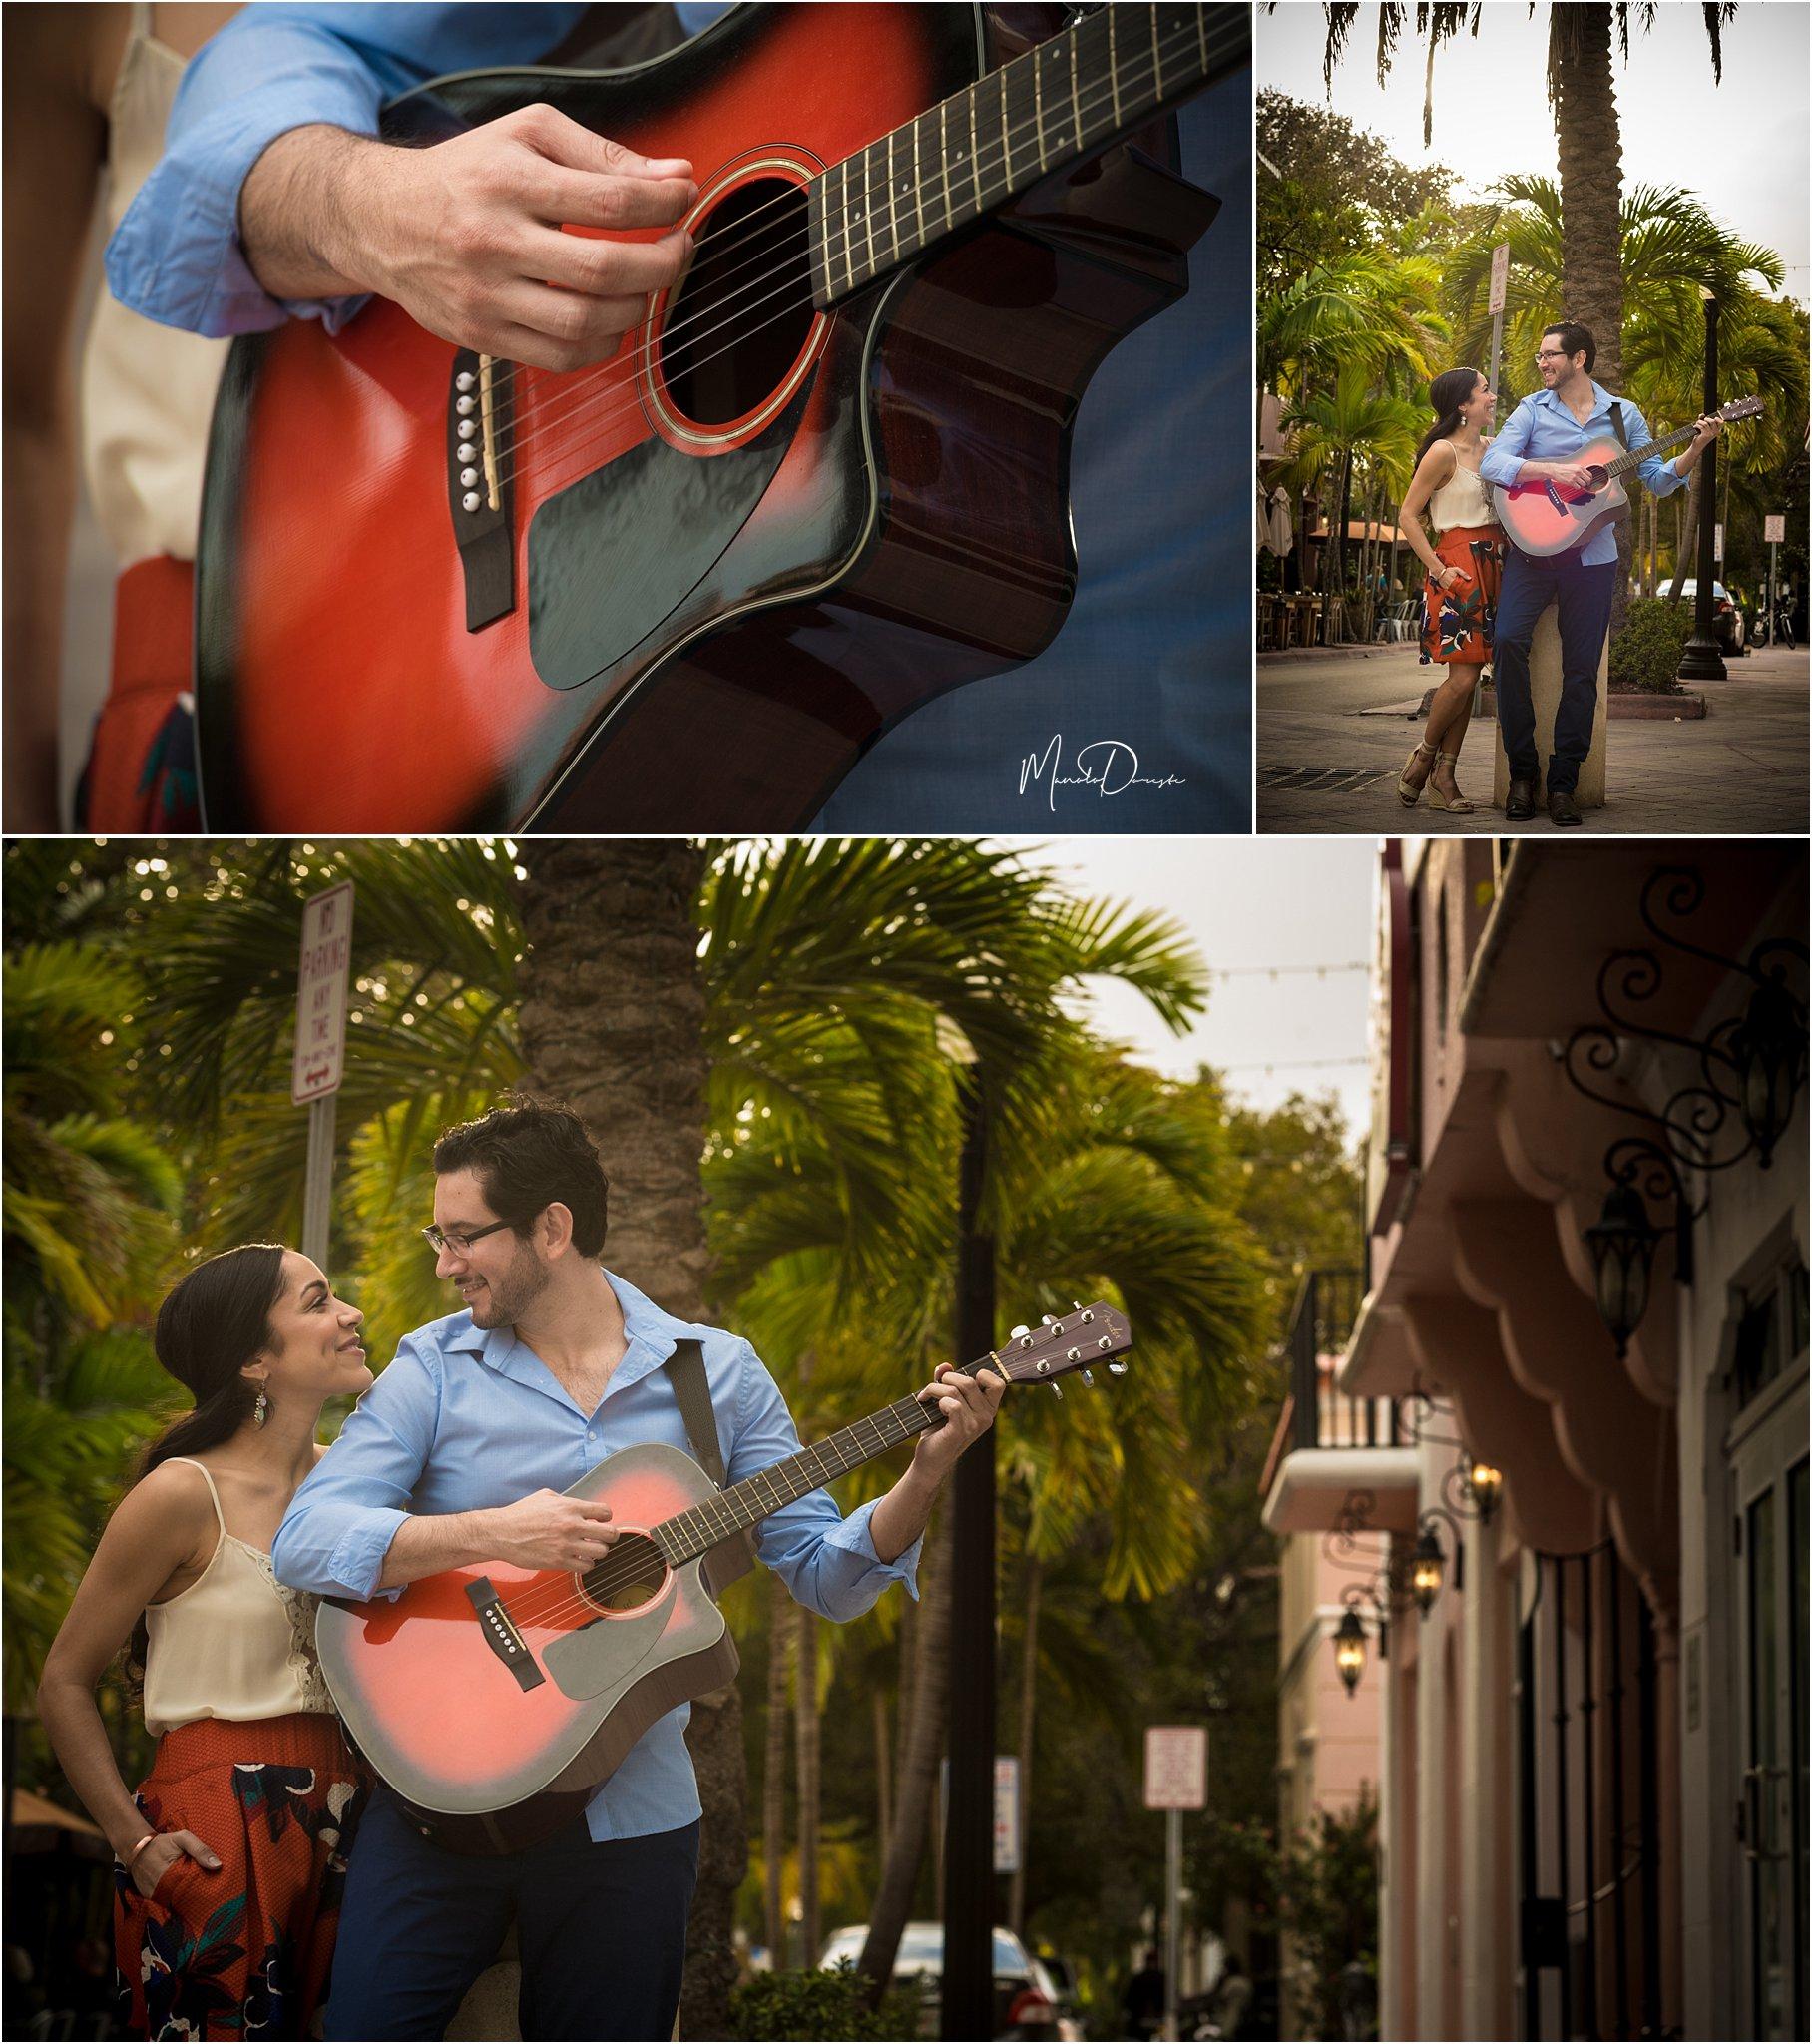 00769_ManoloDoreste_InFocusStudios_Wedding_Family_Photography_Miami_MiamiPhotographer.jpg